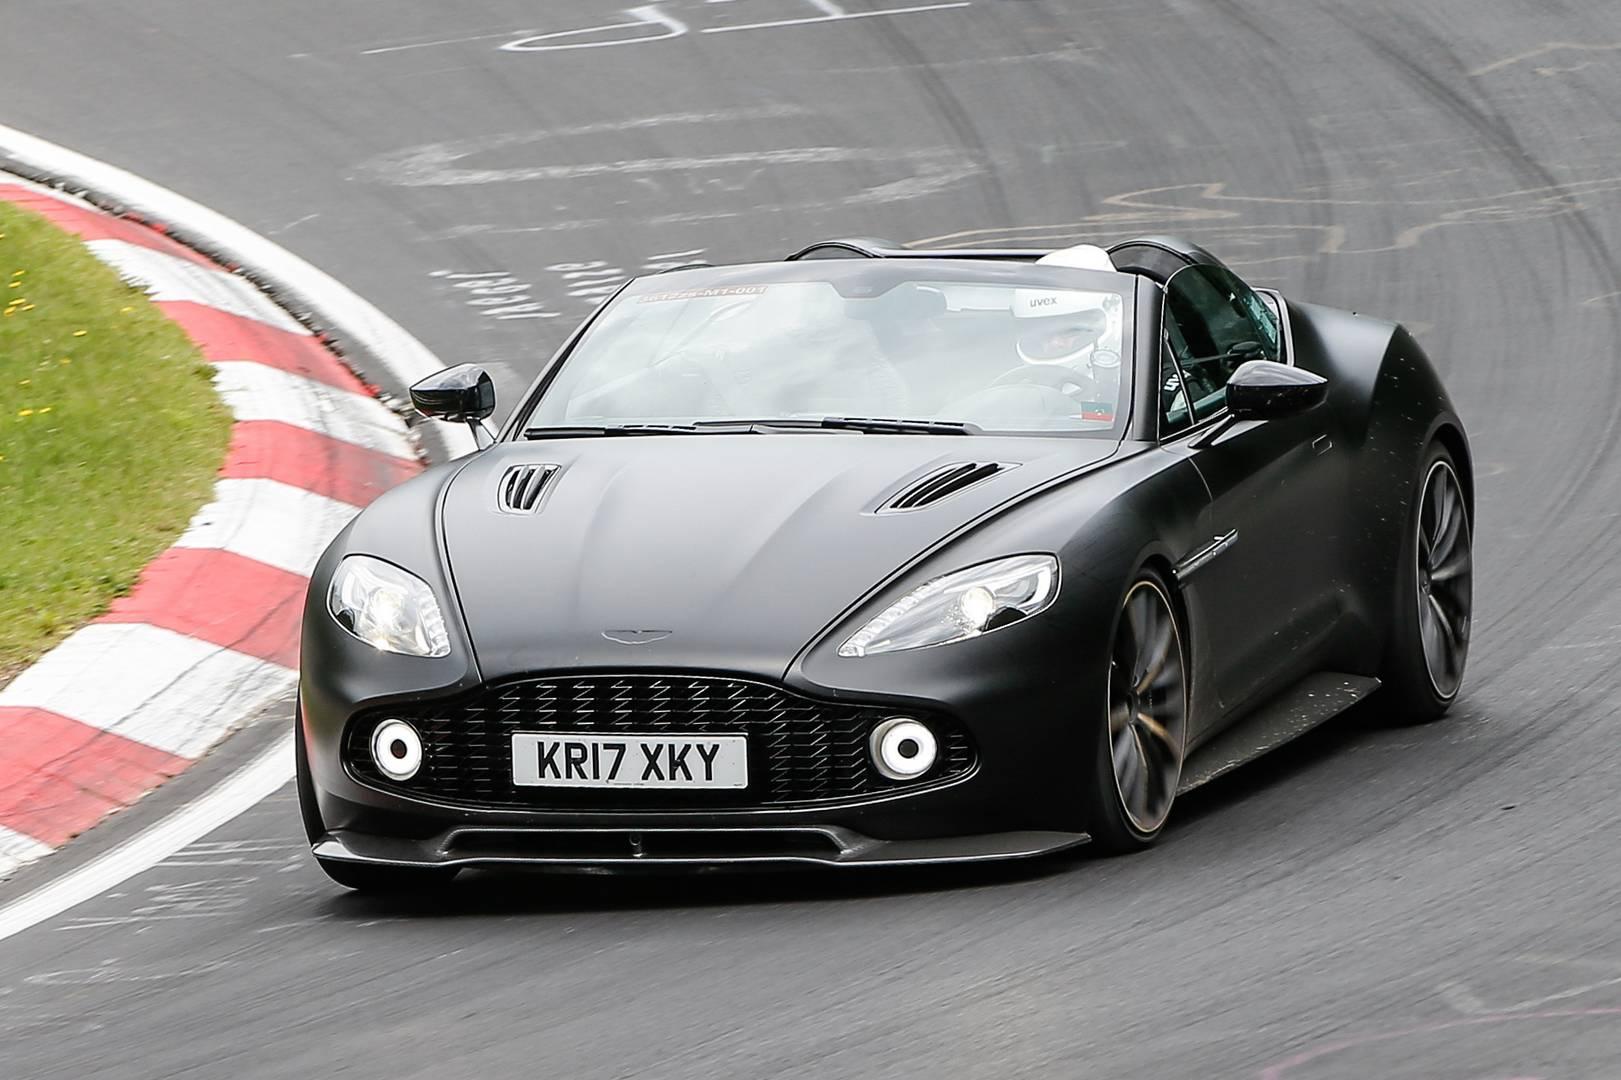 Of Zagato Aston Martin Vanquish Speedster Seen For The First - Aston martin vanquish zagato